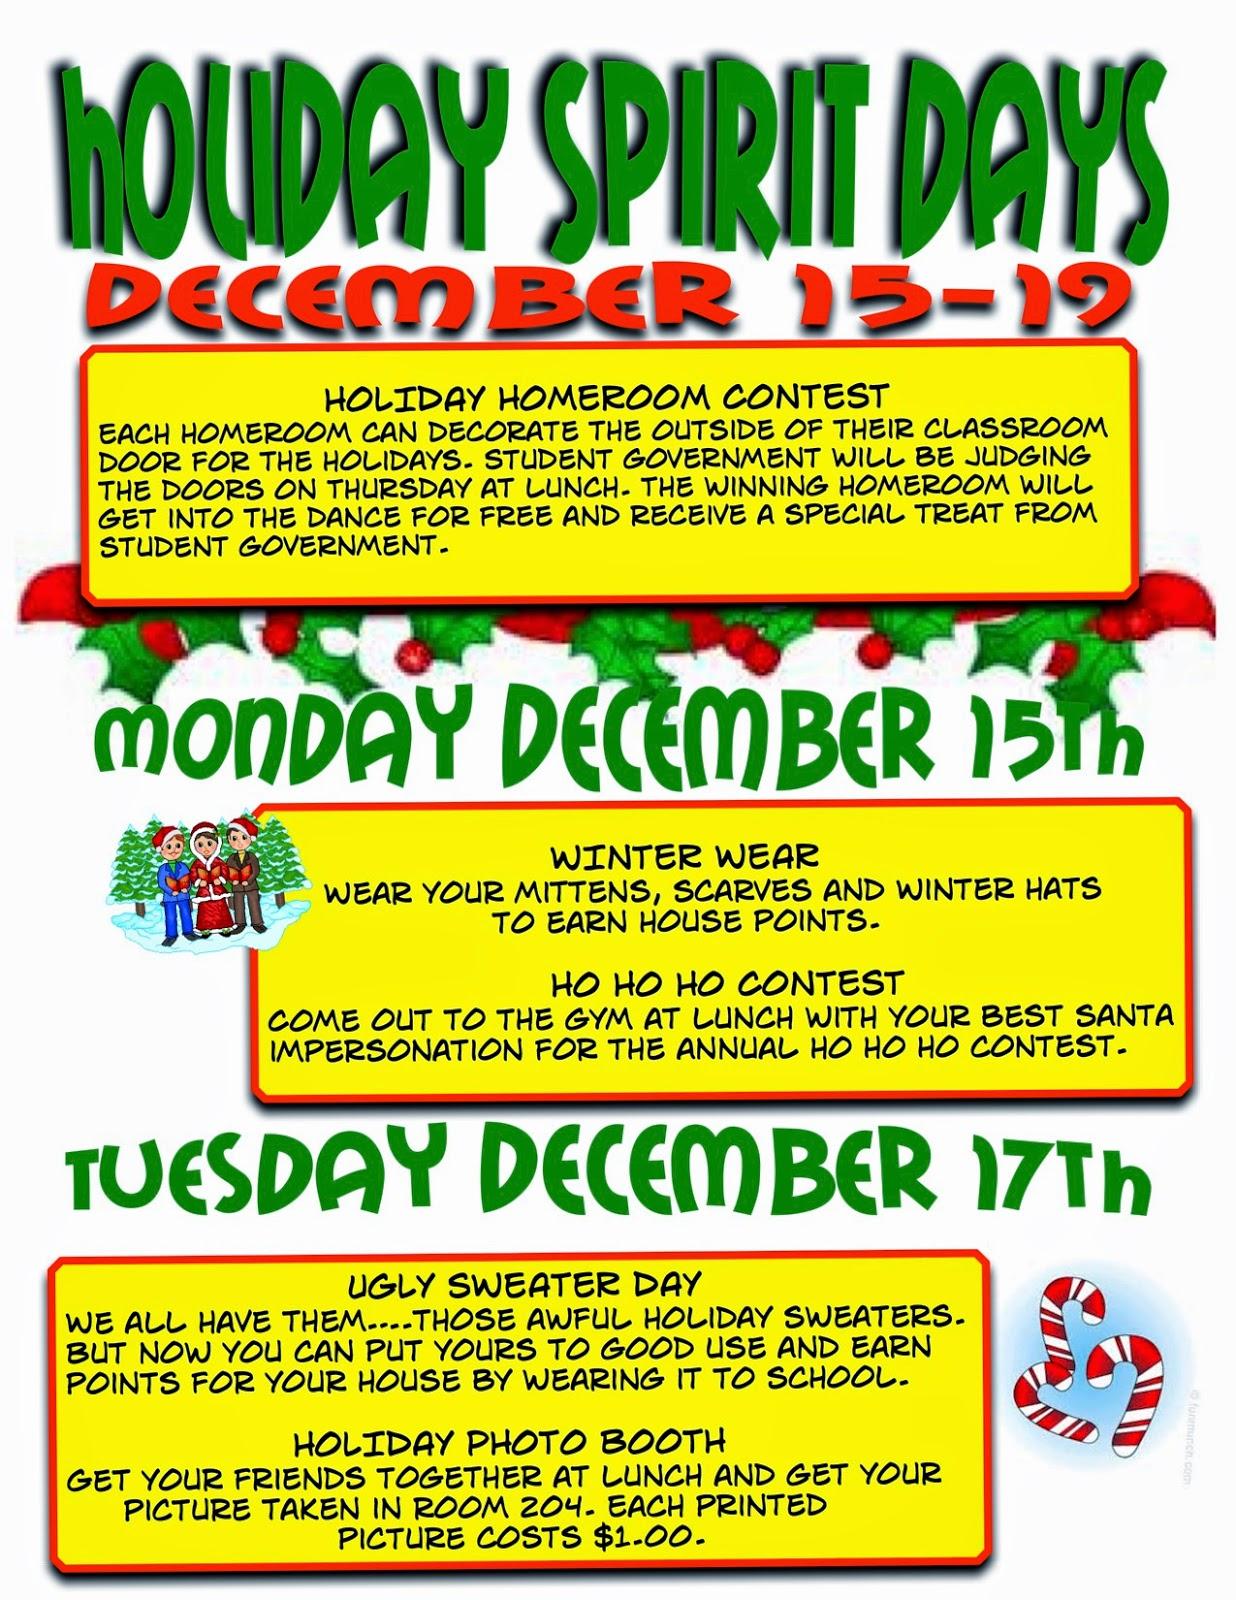 Christmas Spirit Week Ideas For Work.Spirit Day Dress Up Ideas Fashion Tips